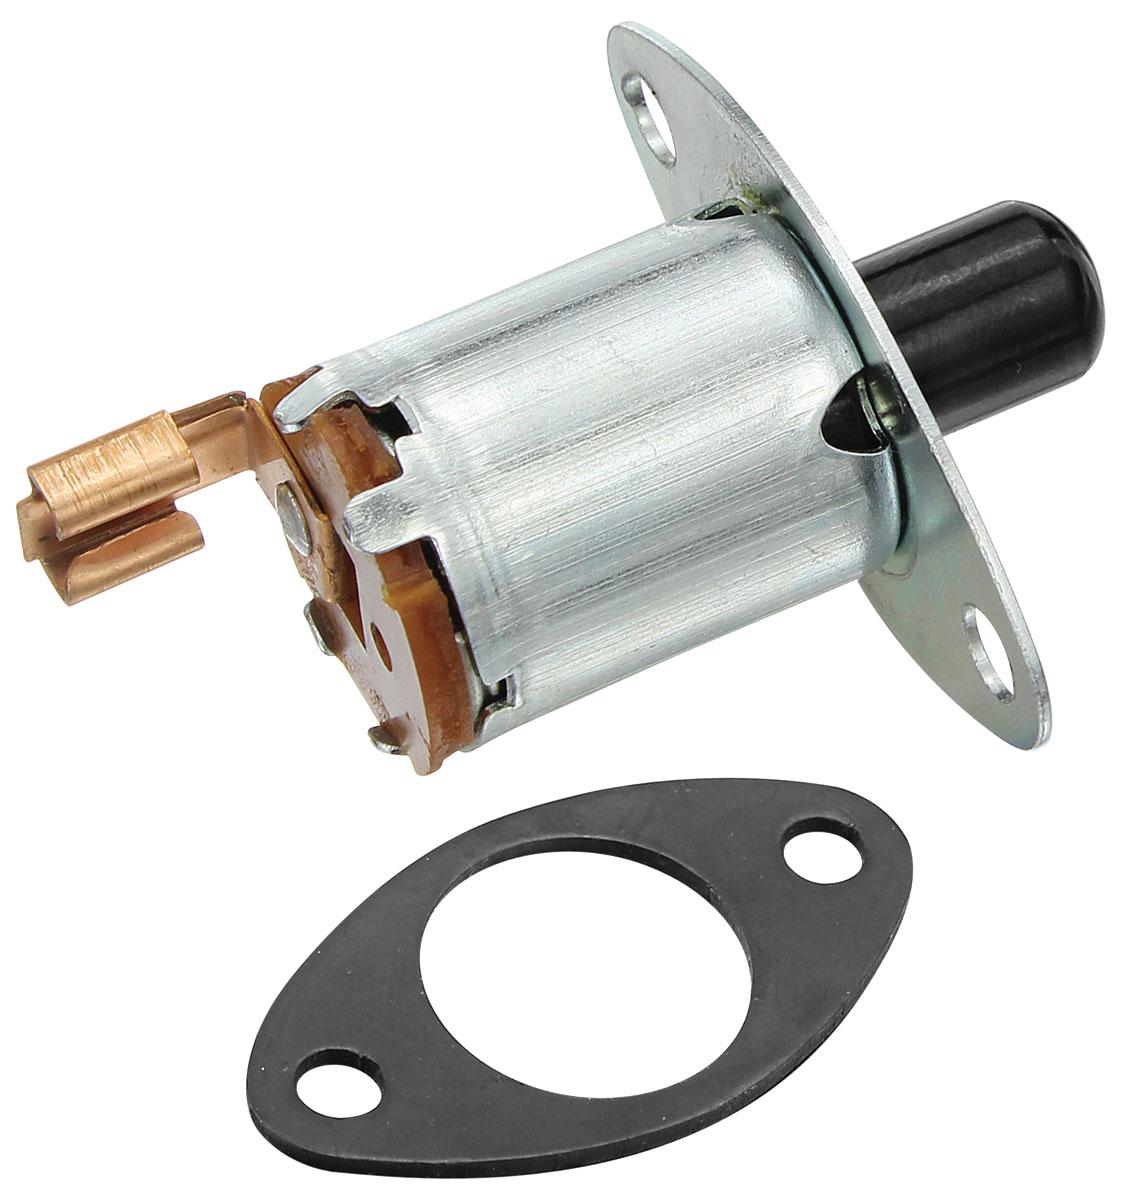 hight resolution of 1954 64 eldorado door jamb switch for dome light courtesy lamp fleet eldo